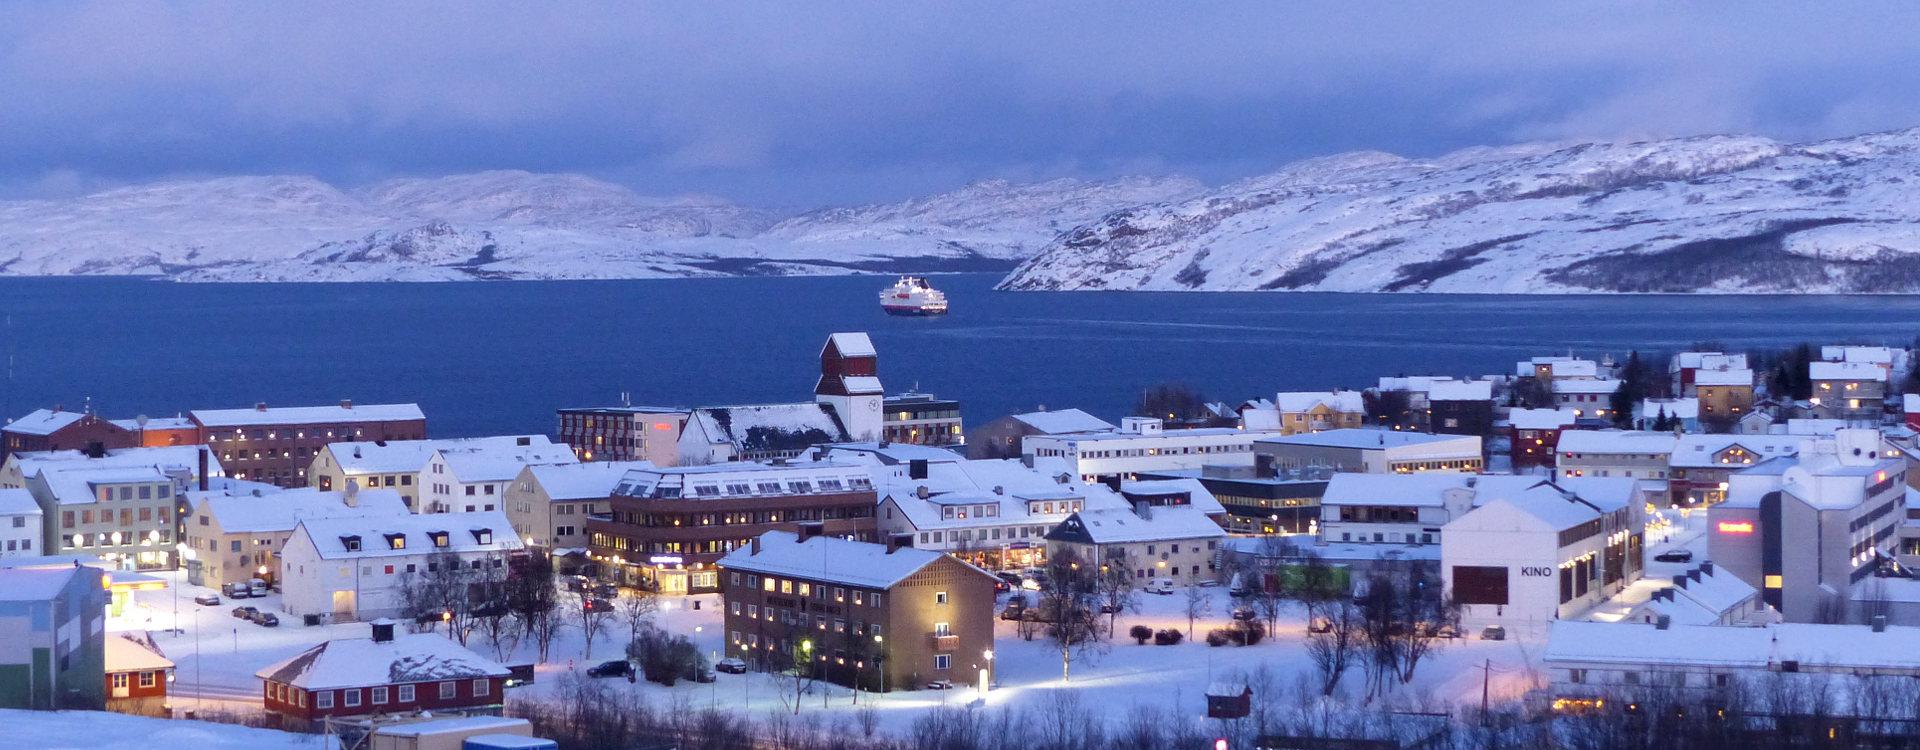 знаю норвегия киркенес сани фото нам должно всею